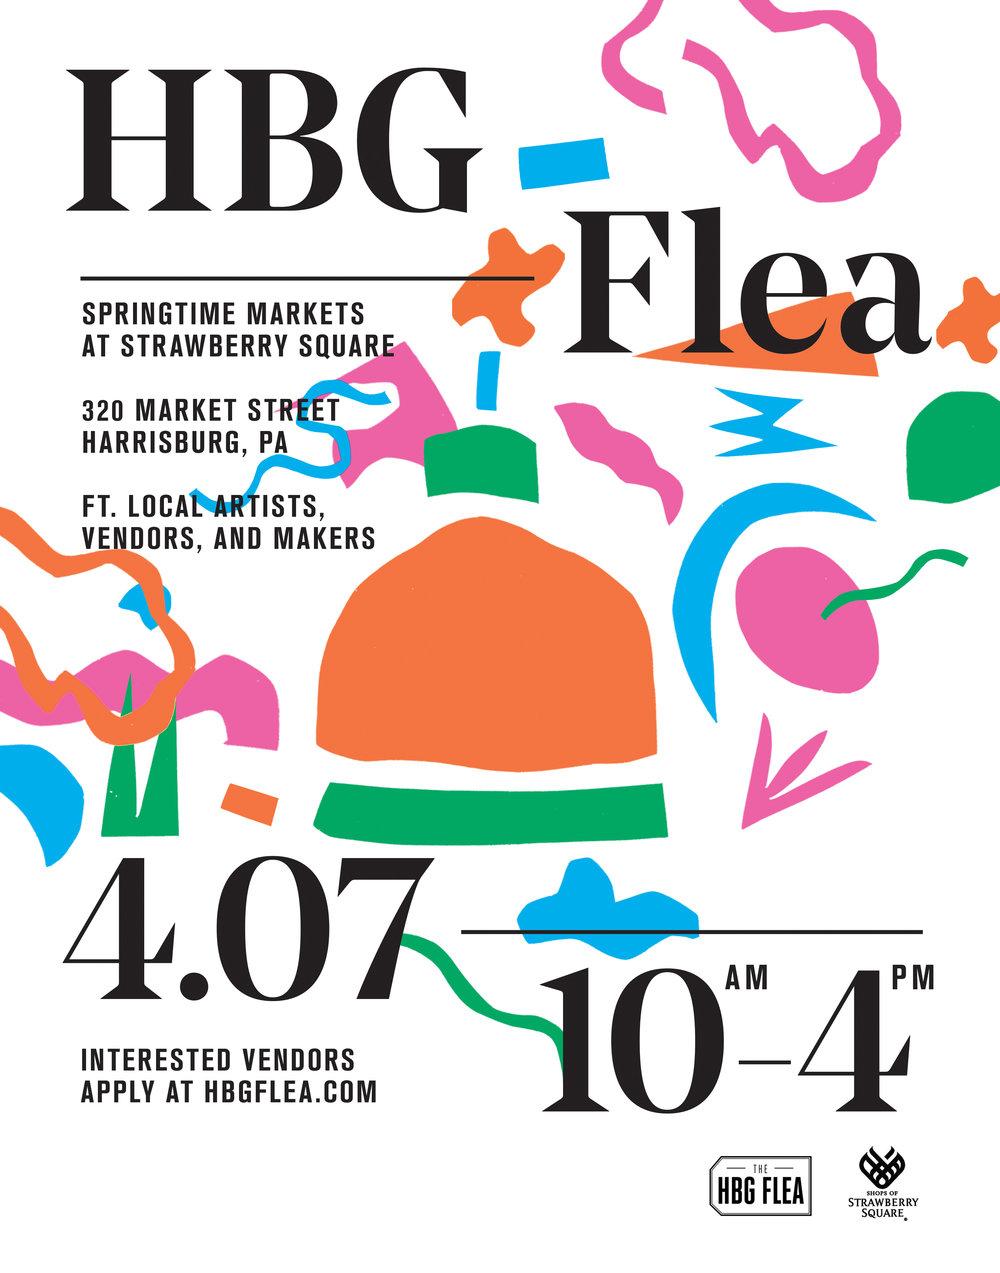 HBG-Flea_Spring-2018_11x14.jpg